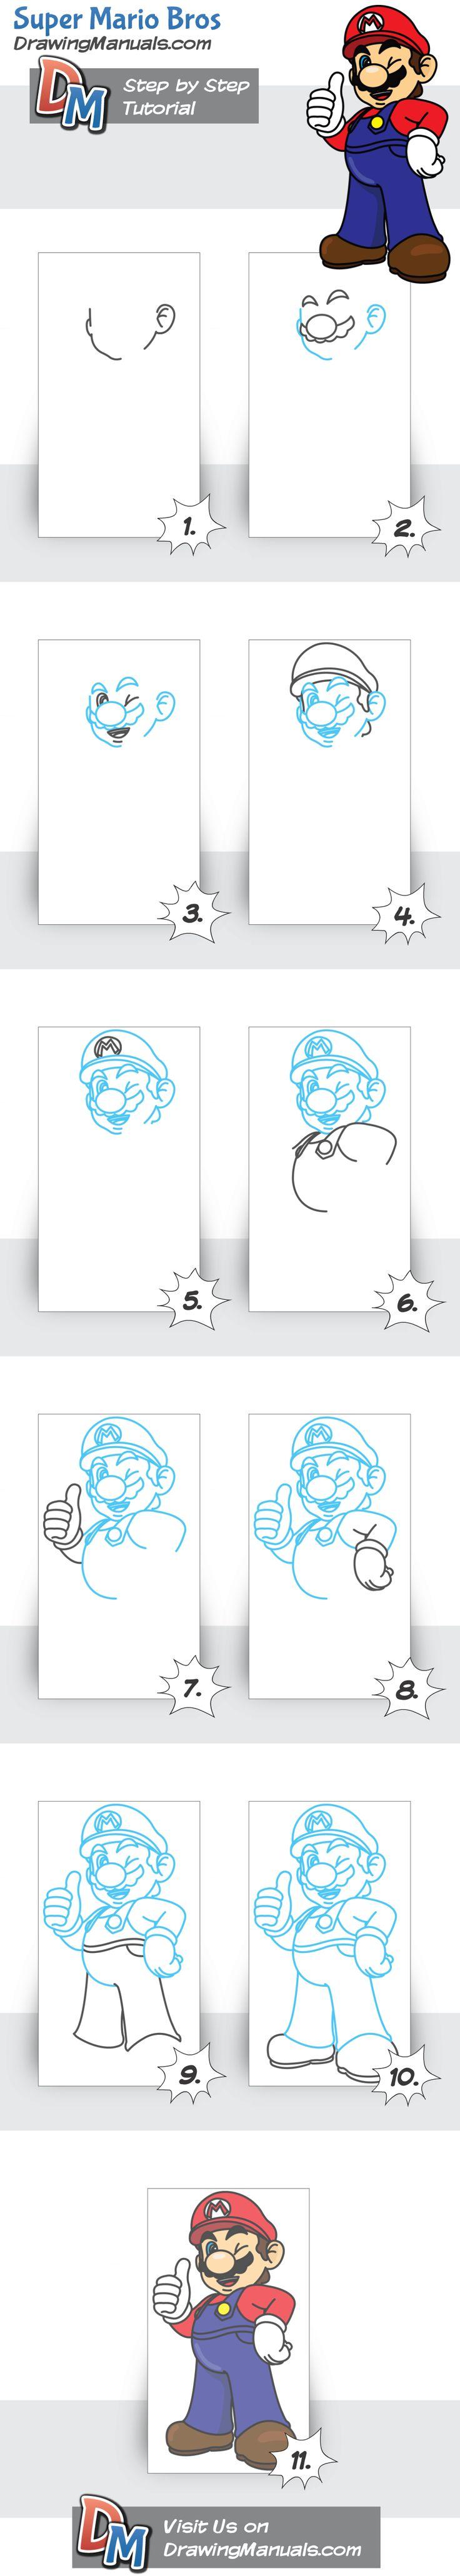 How to Draw Super Mario Bros from Nintendo http://drawingmanuals.com/manual/how-to-draw-super-mario-bros-nintendo/